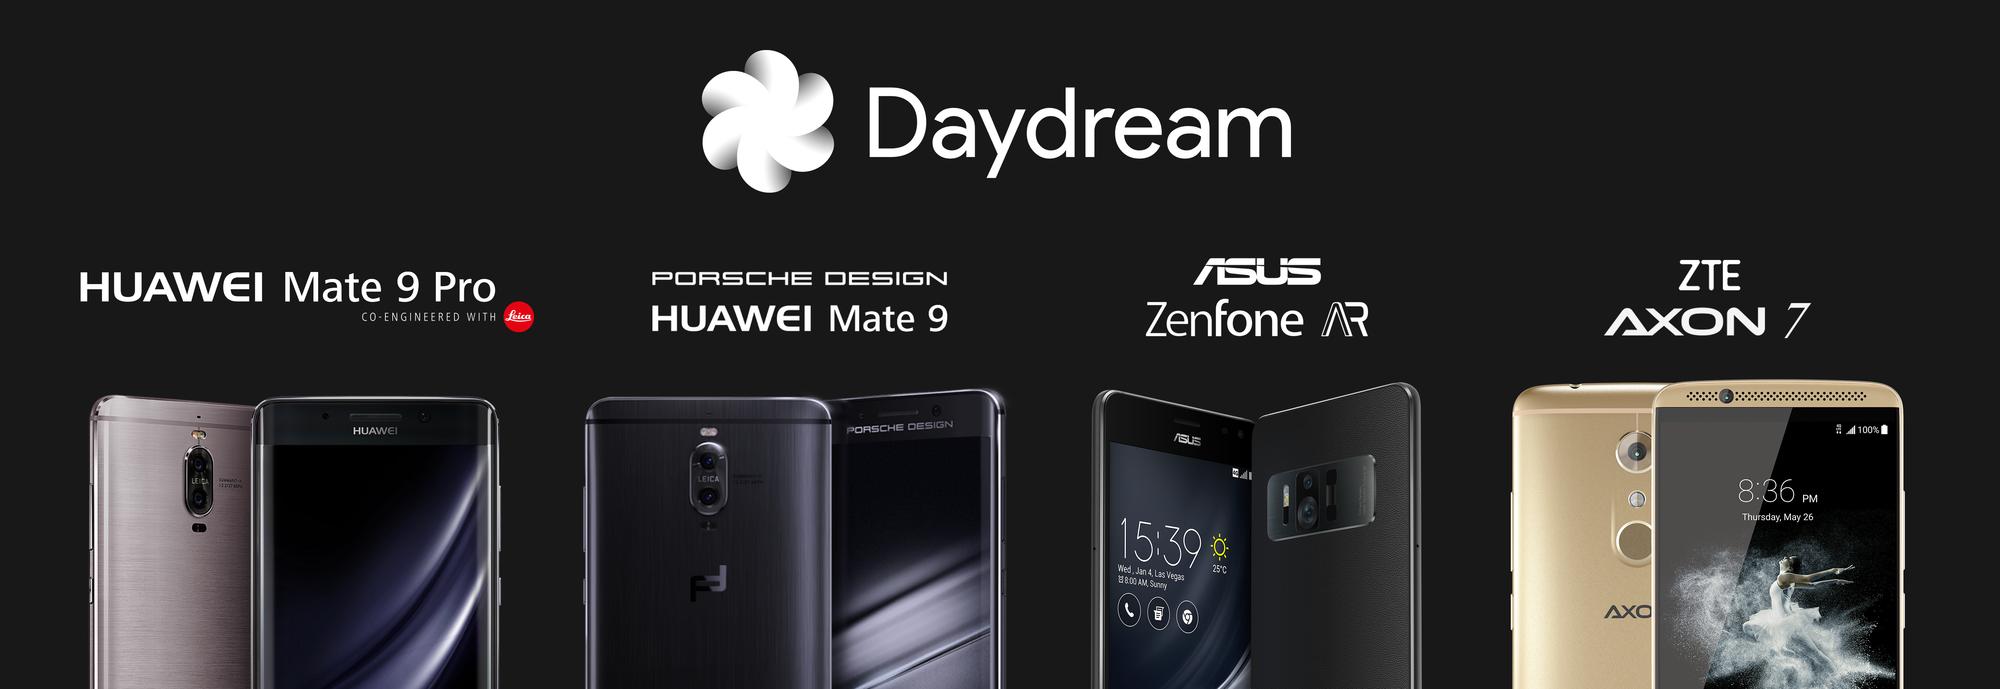 Google Daydream kompatibilis Huawei telefonok